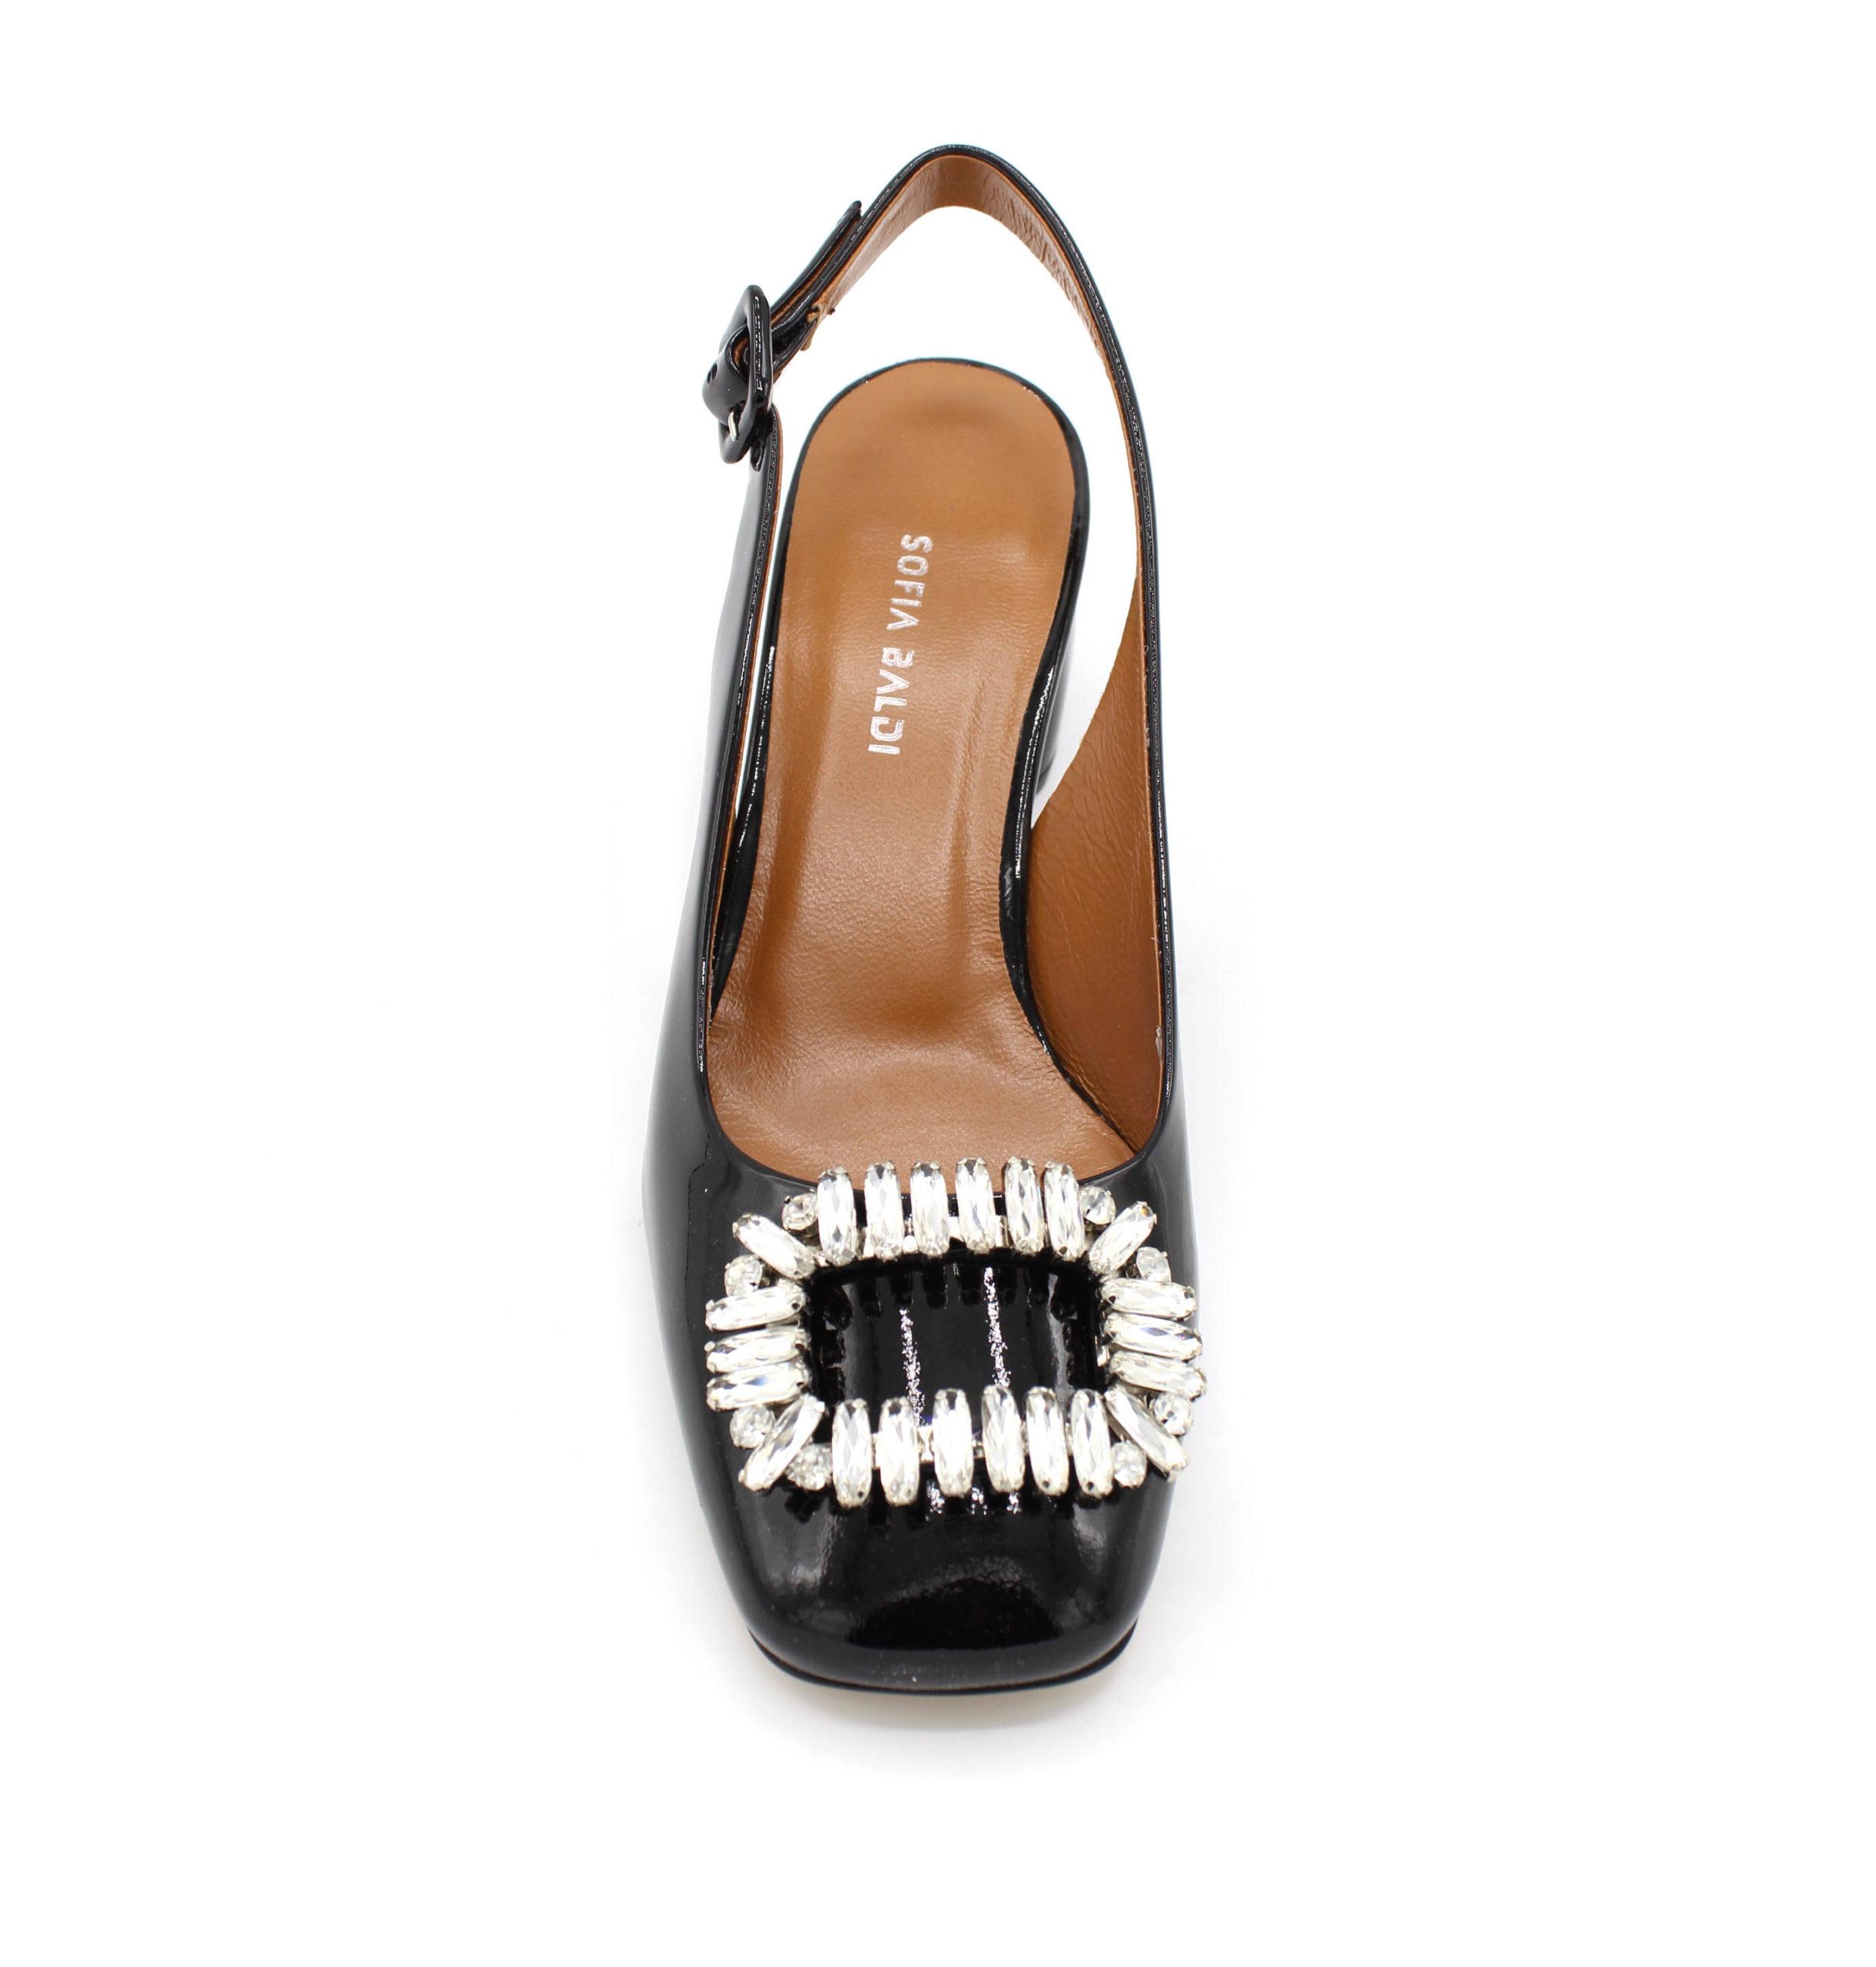 Solfia Baldi Shoes - Kontessa